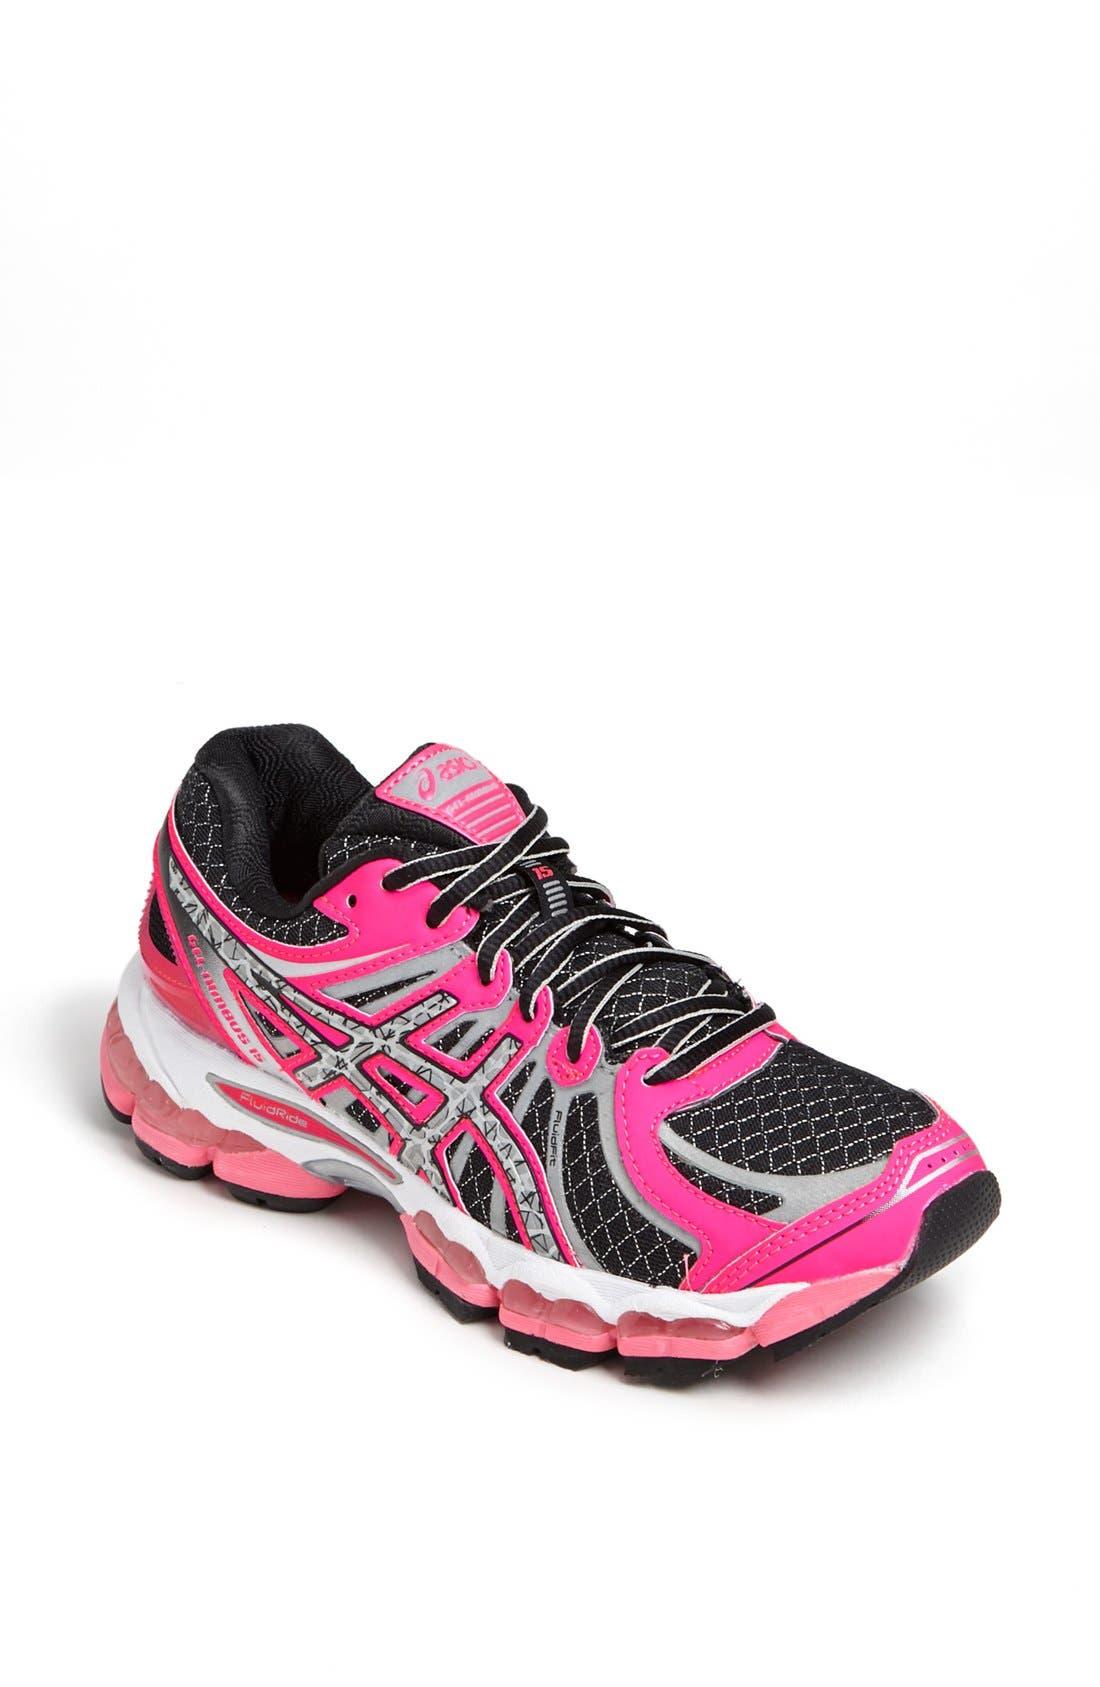 Main Image - Asics® 'GEL-Nimbus® 15 Lite' Running Shoe (Women)